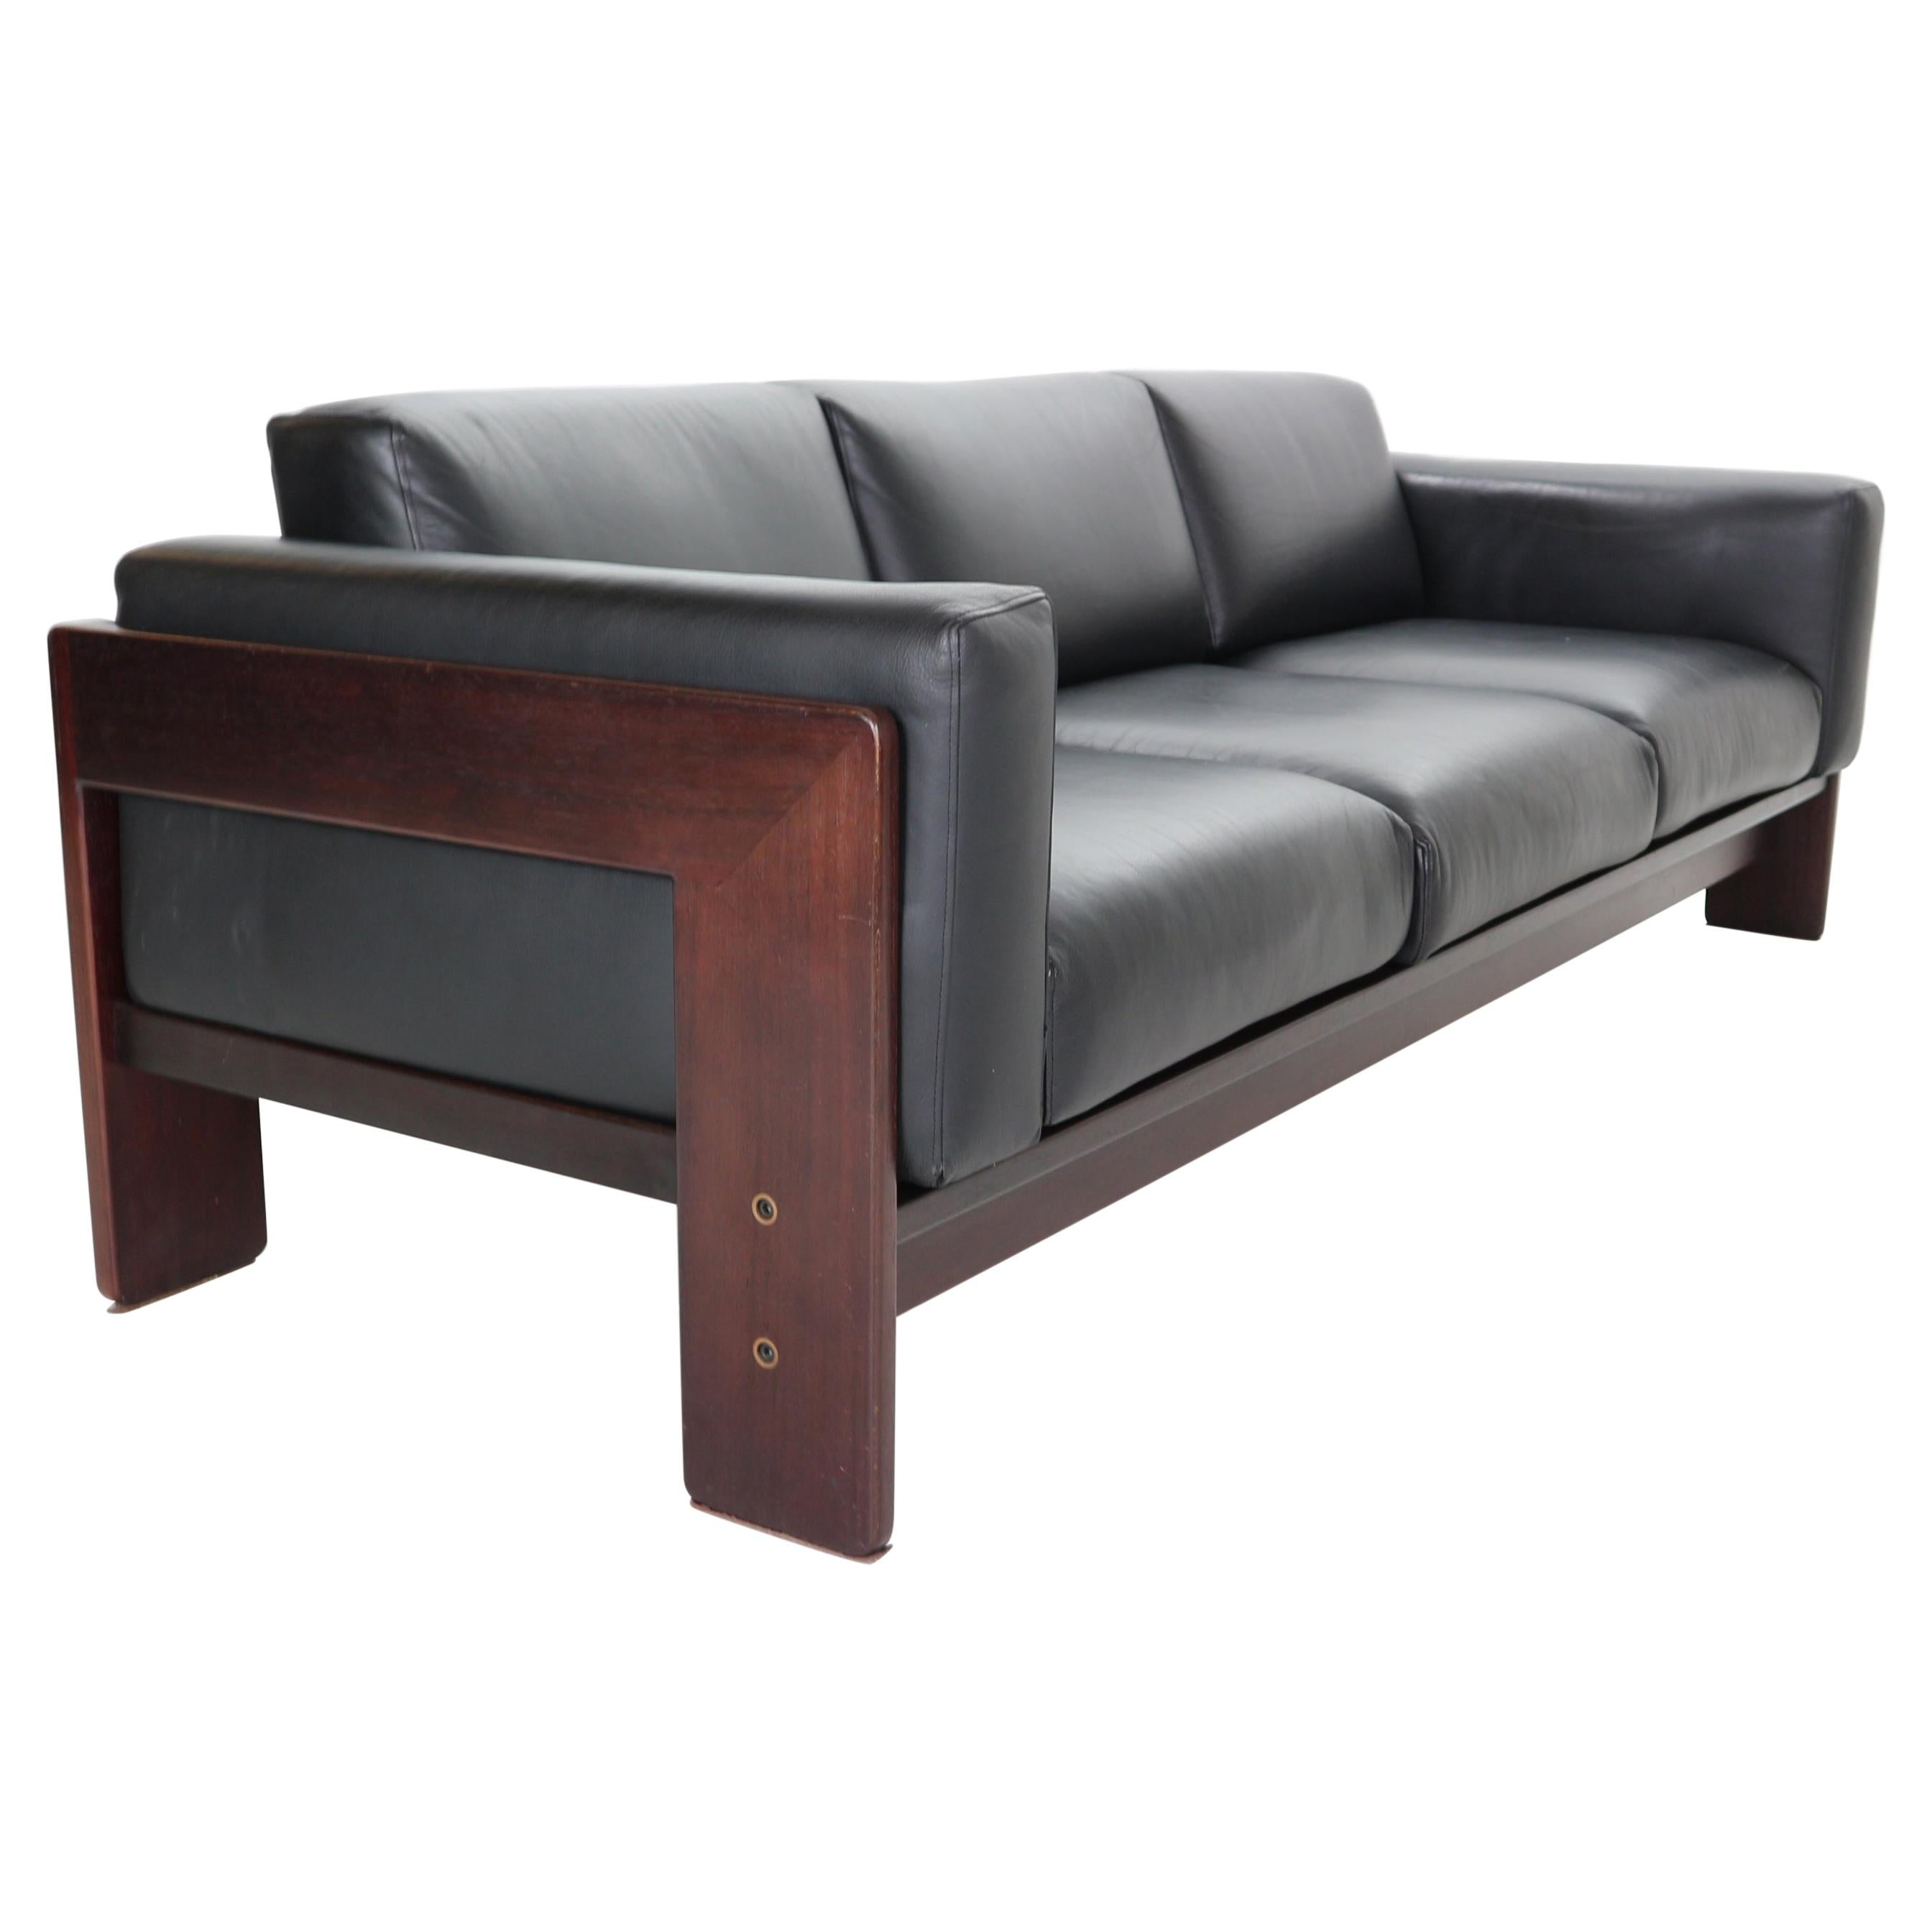 "Tobia Scarpa Black Leather ""Bastiano"" 3-Seater Sofa for Knoll, 1960s, Italy"